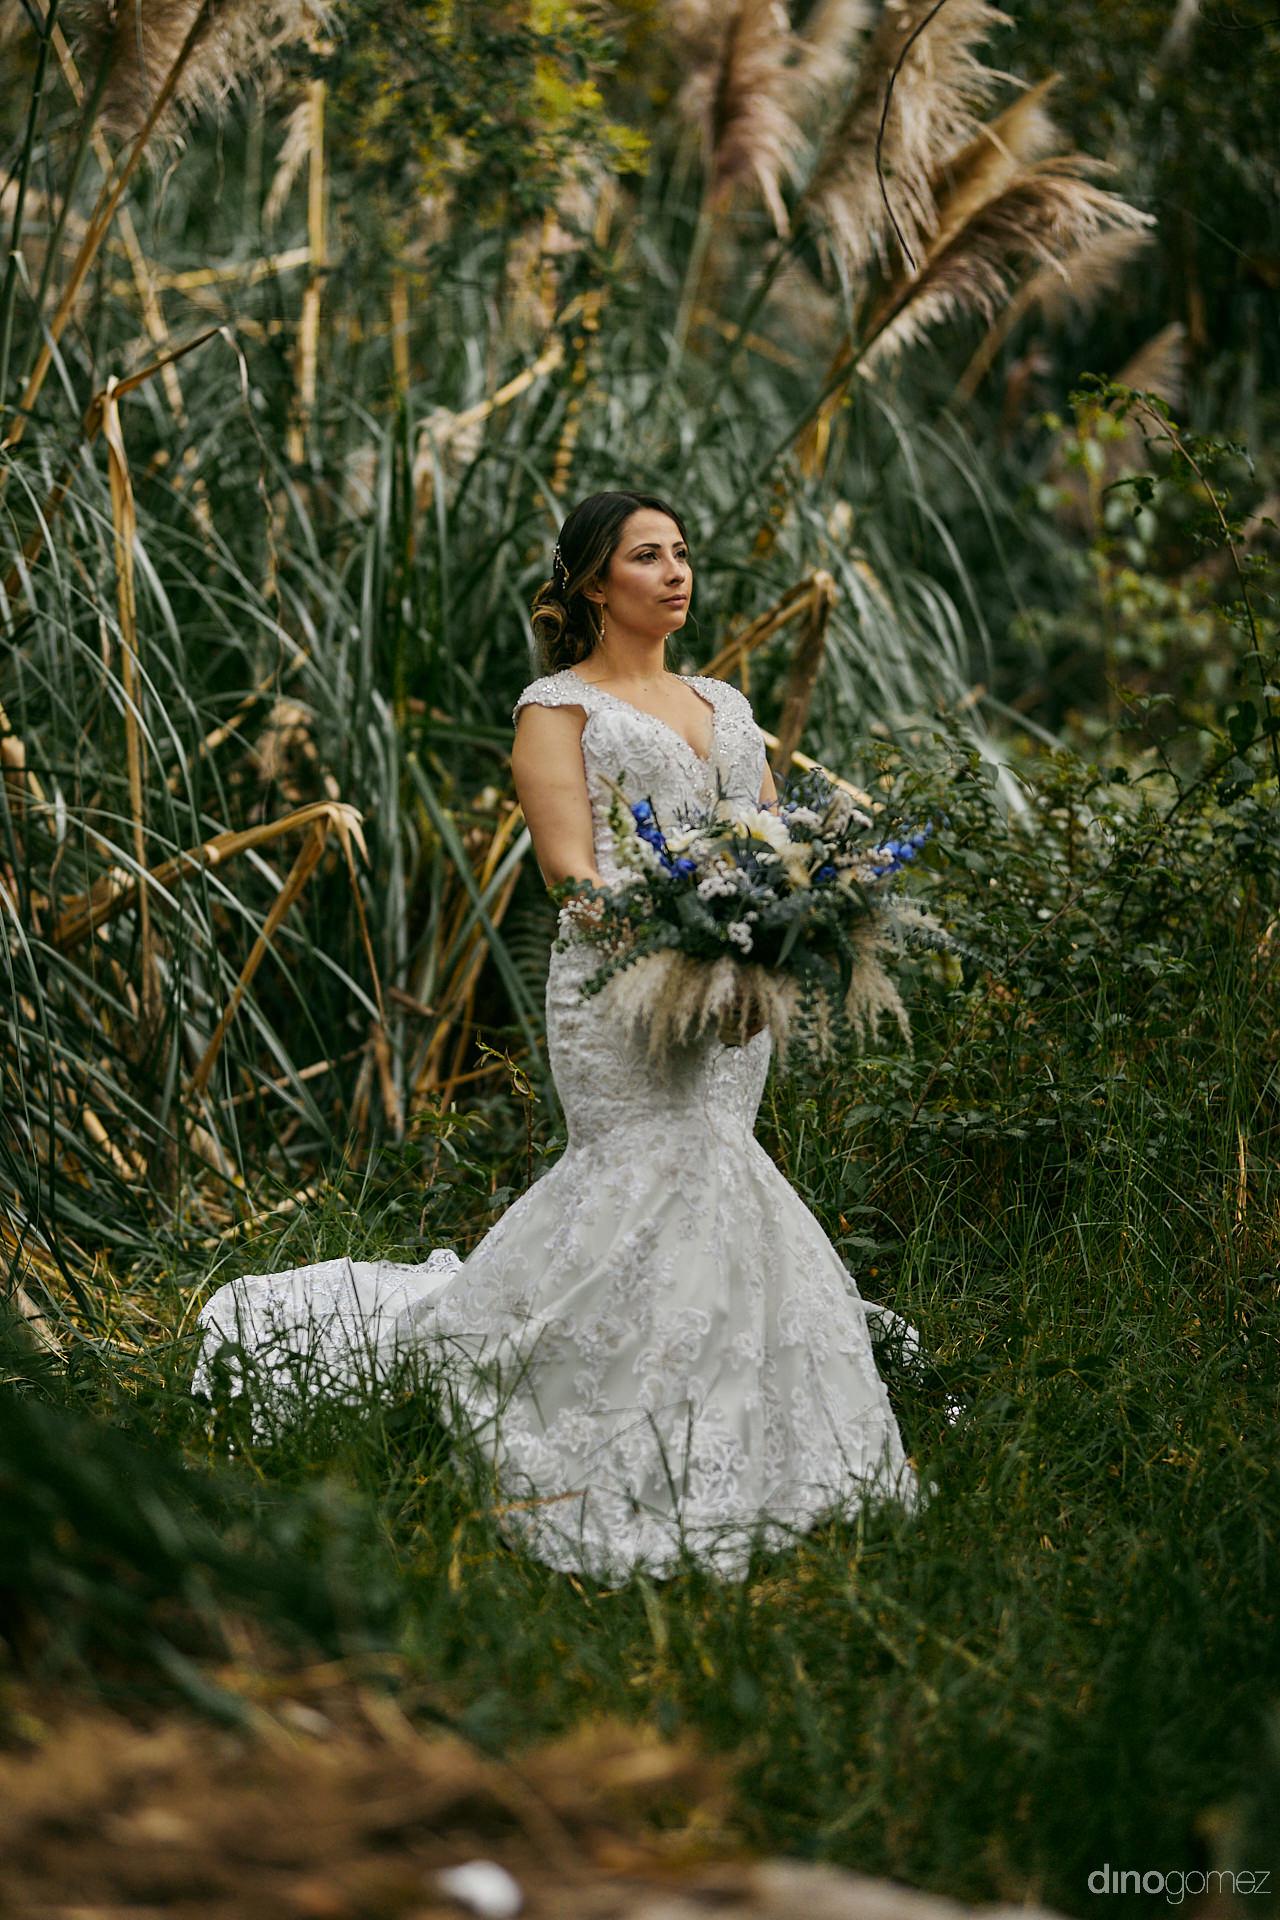 017 - Diy Budget Destination Weddings Can Be Prety Too!